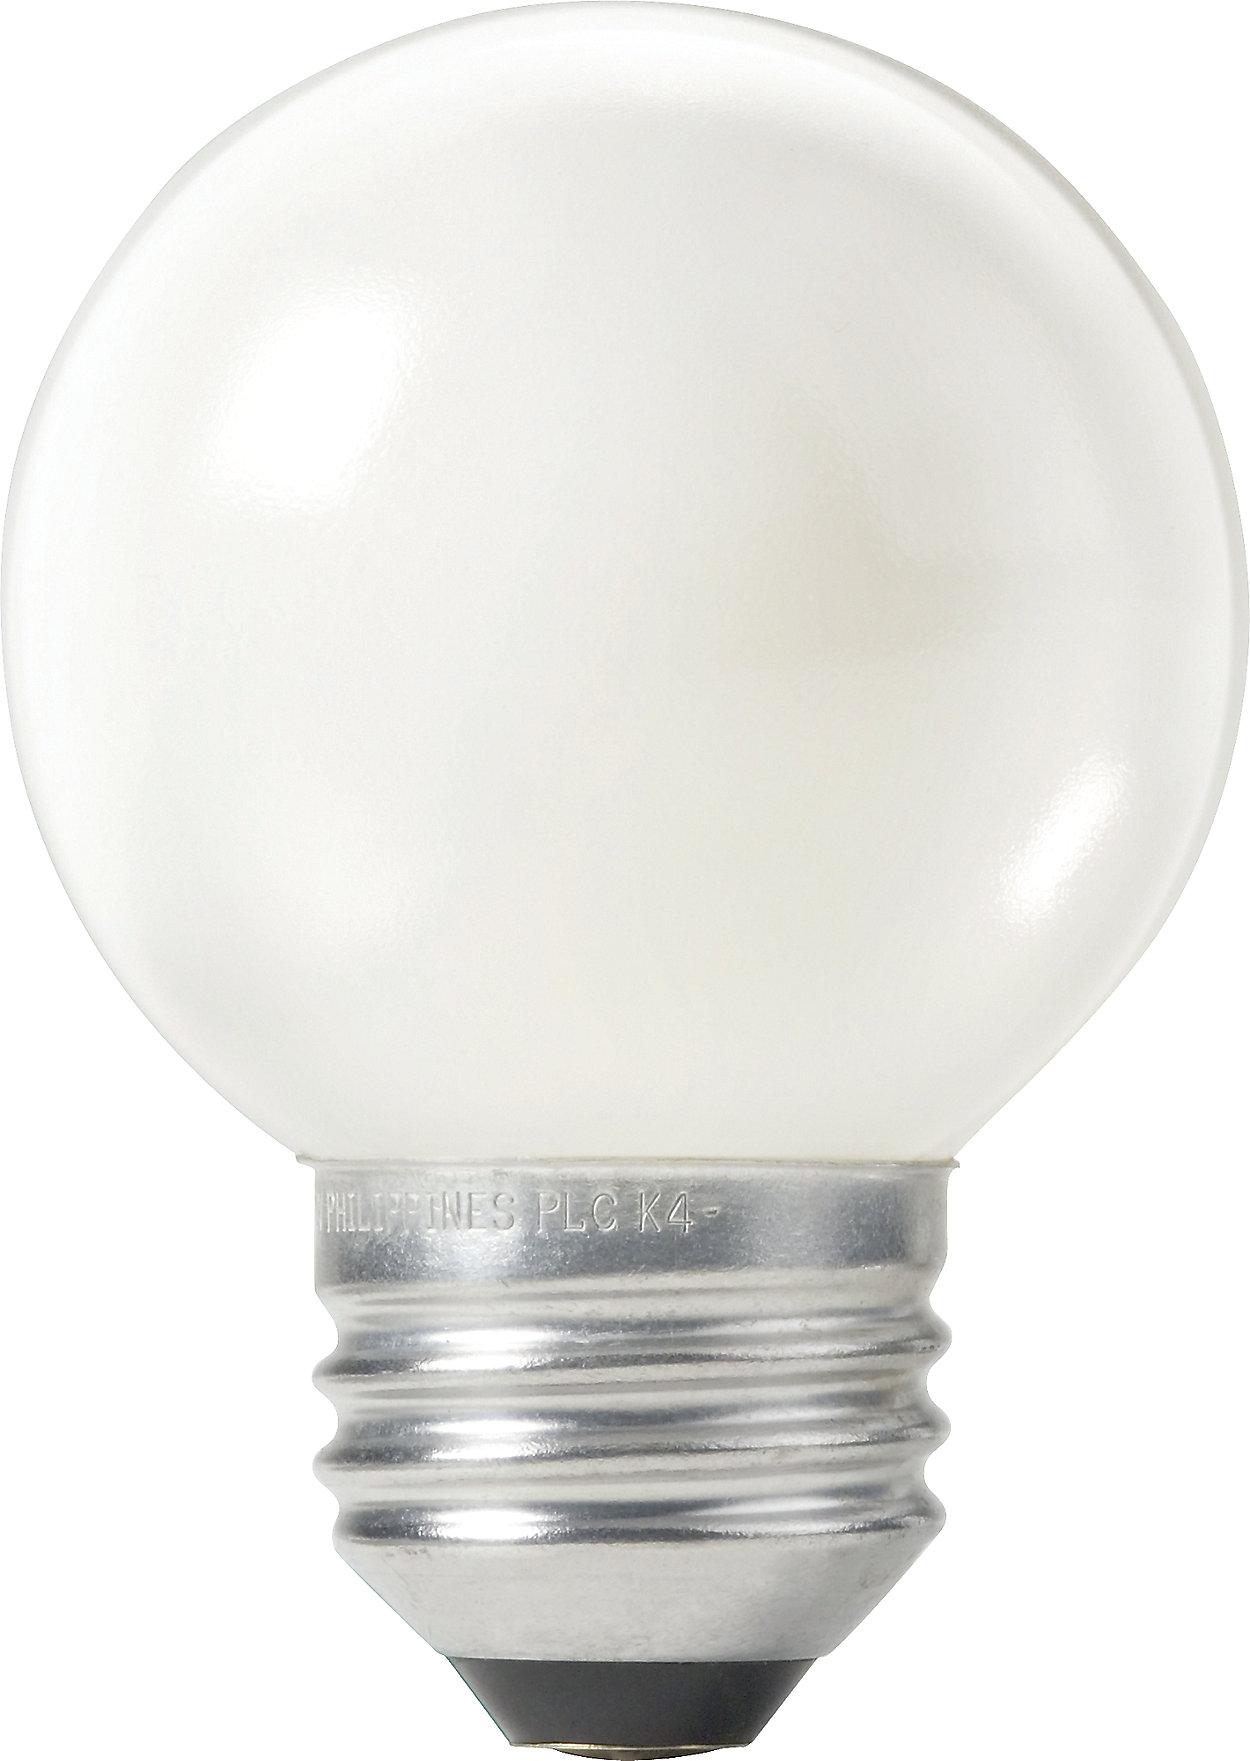 Deco Globe (Clear G16.5 cand.)